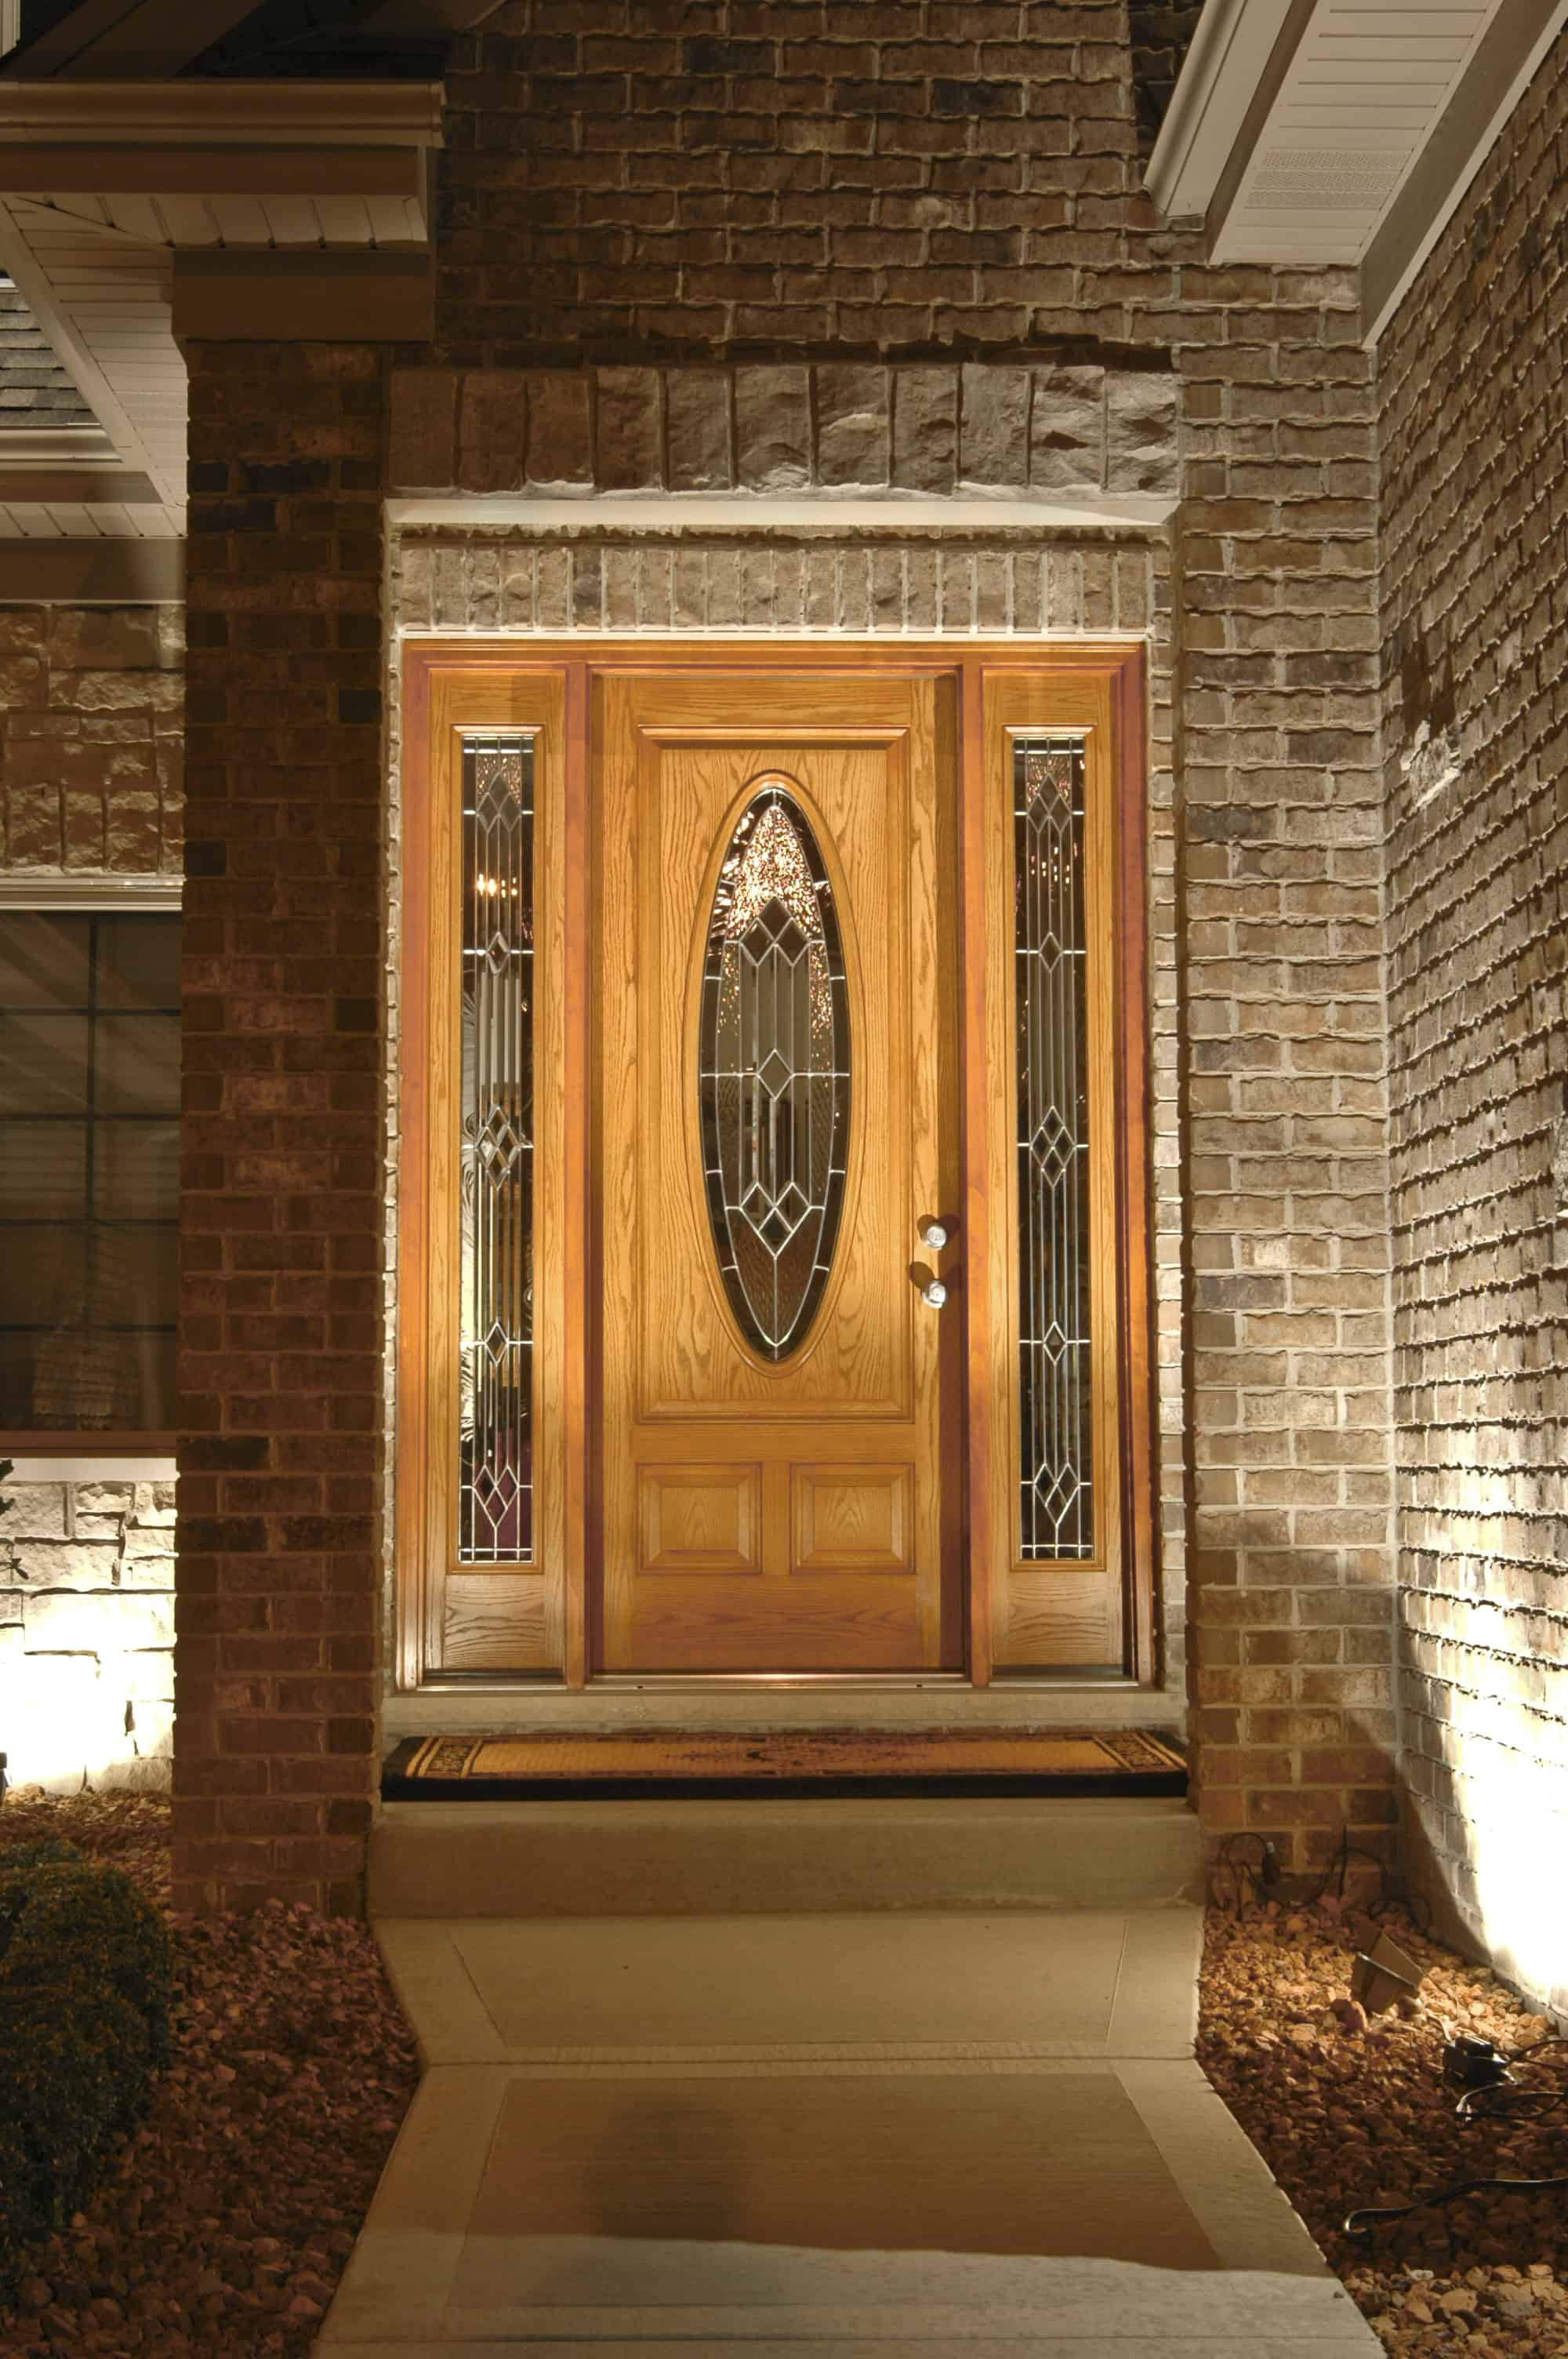 Door Lighting Dramatic Scroll Work Sconces On Each Side Of An Entry Door Lighting Has